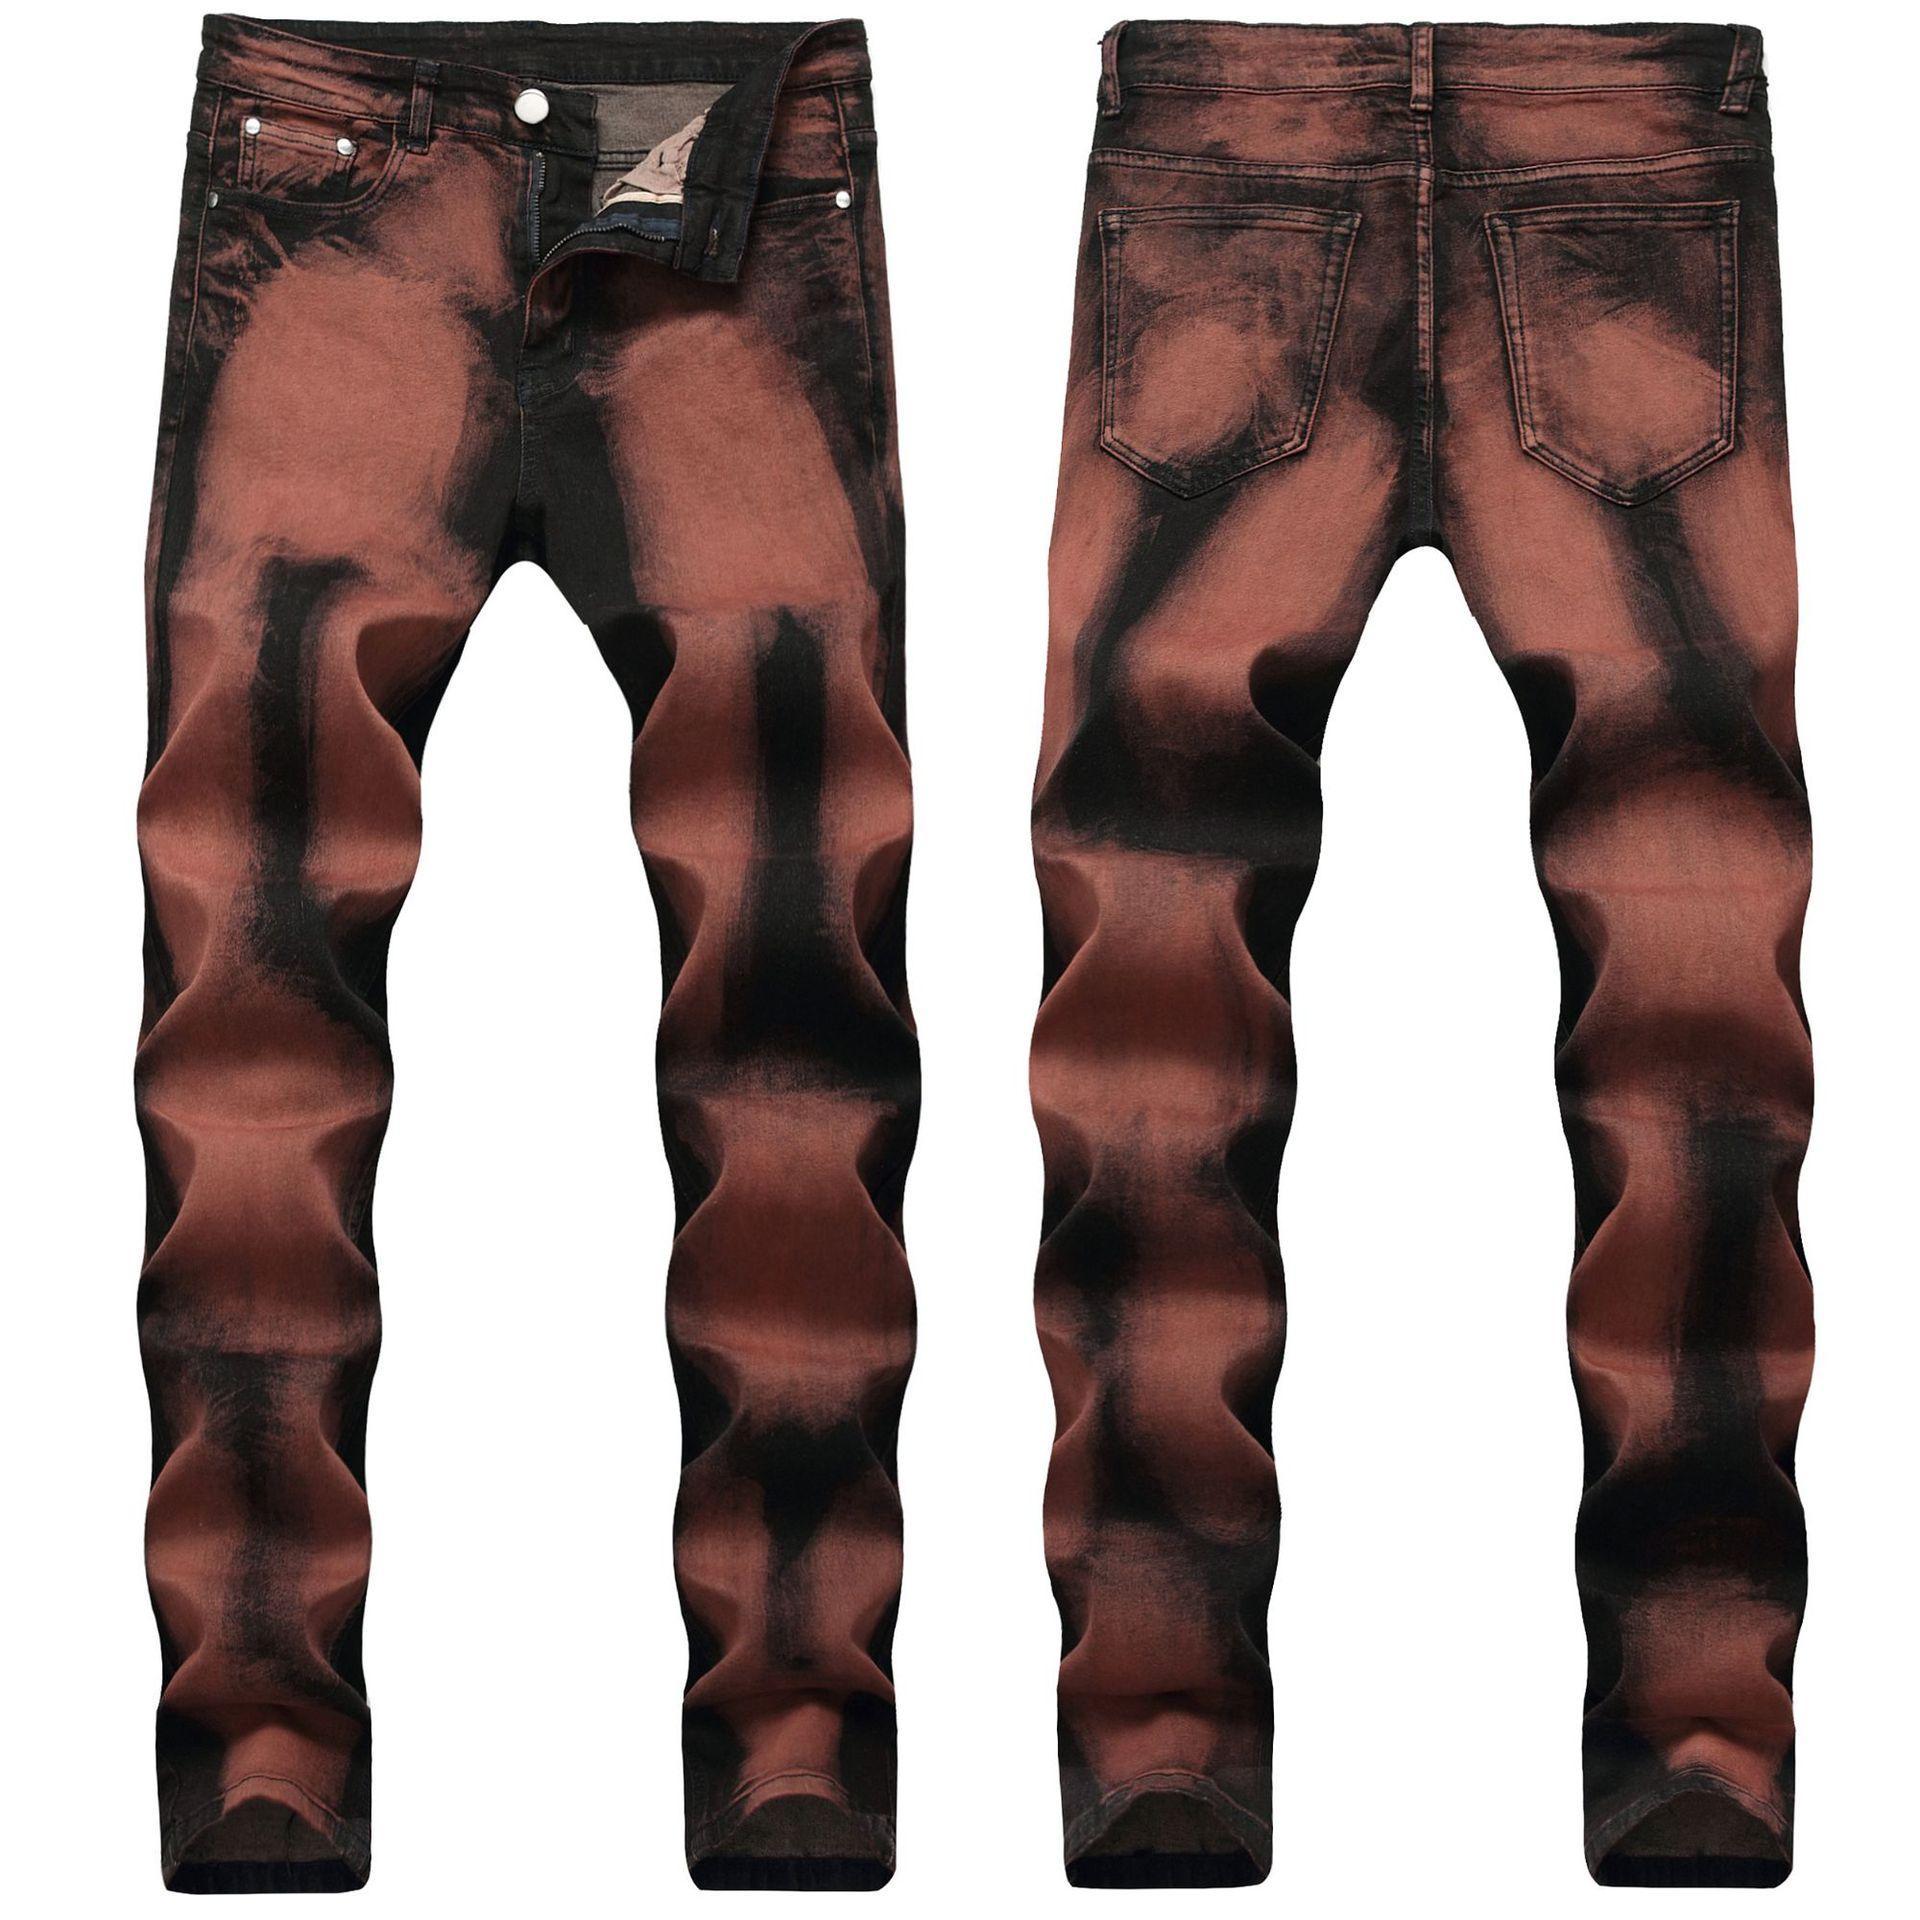 Sıska Erkek Kot Serin Erkekler Kot Streç Slim Fit Düz Denim Biker Jeans Hip Hop Erkekler Streetwear 1603 #